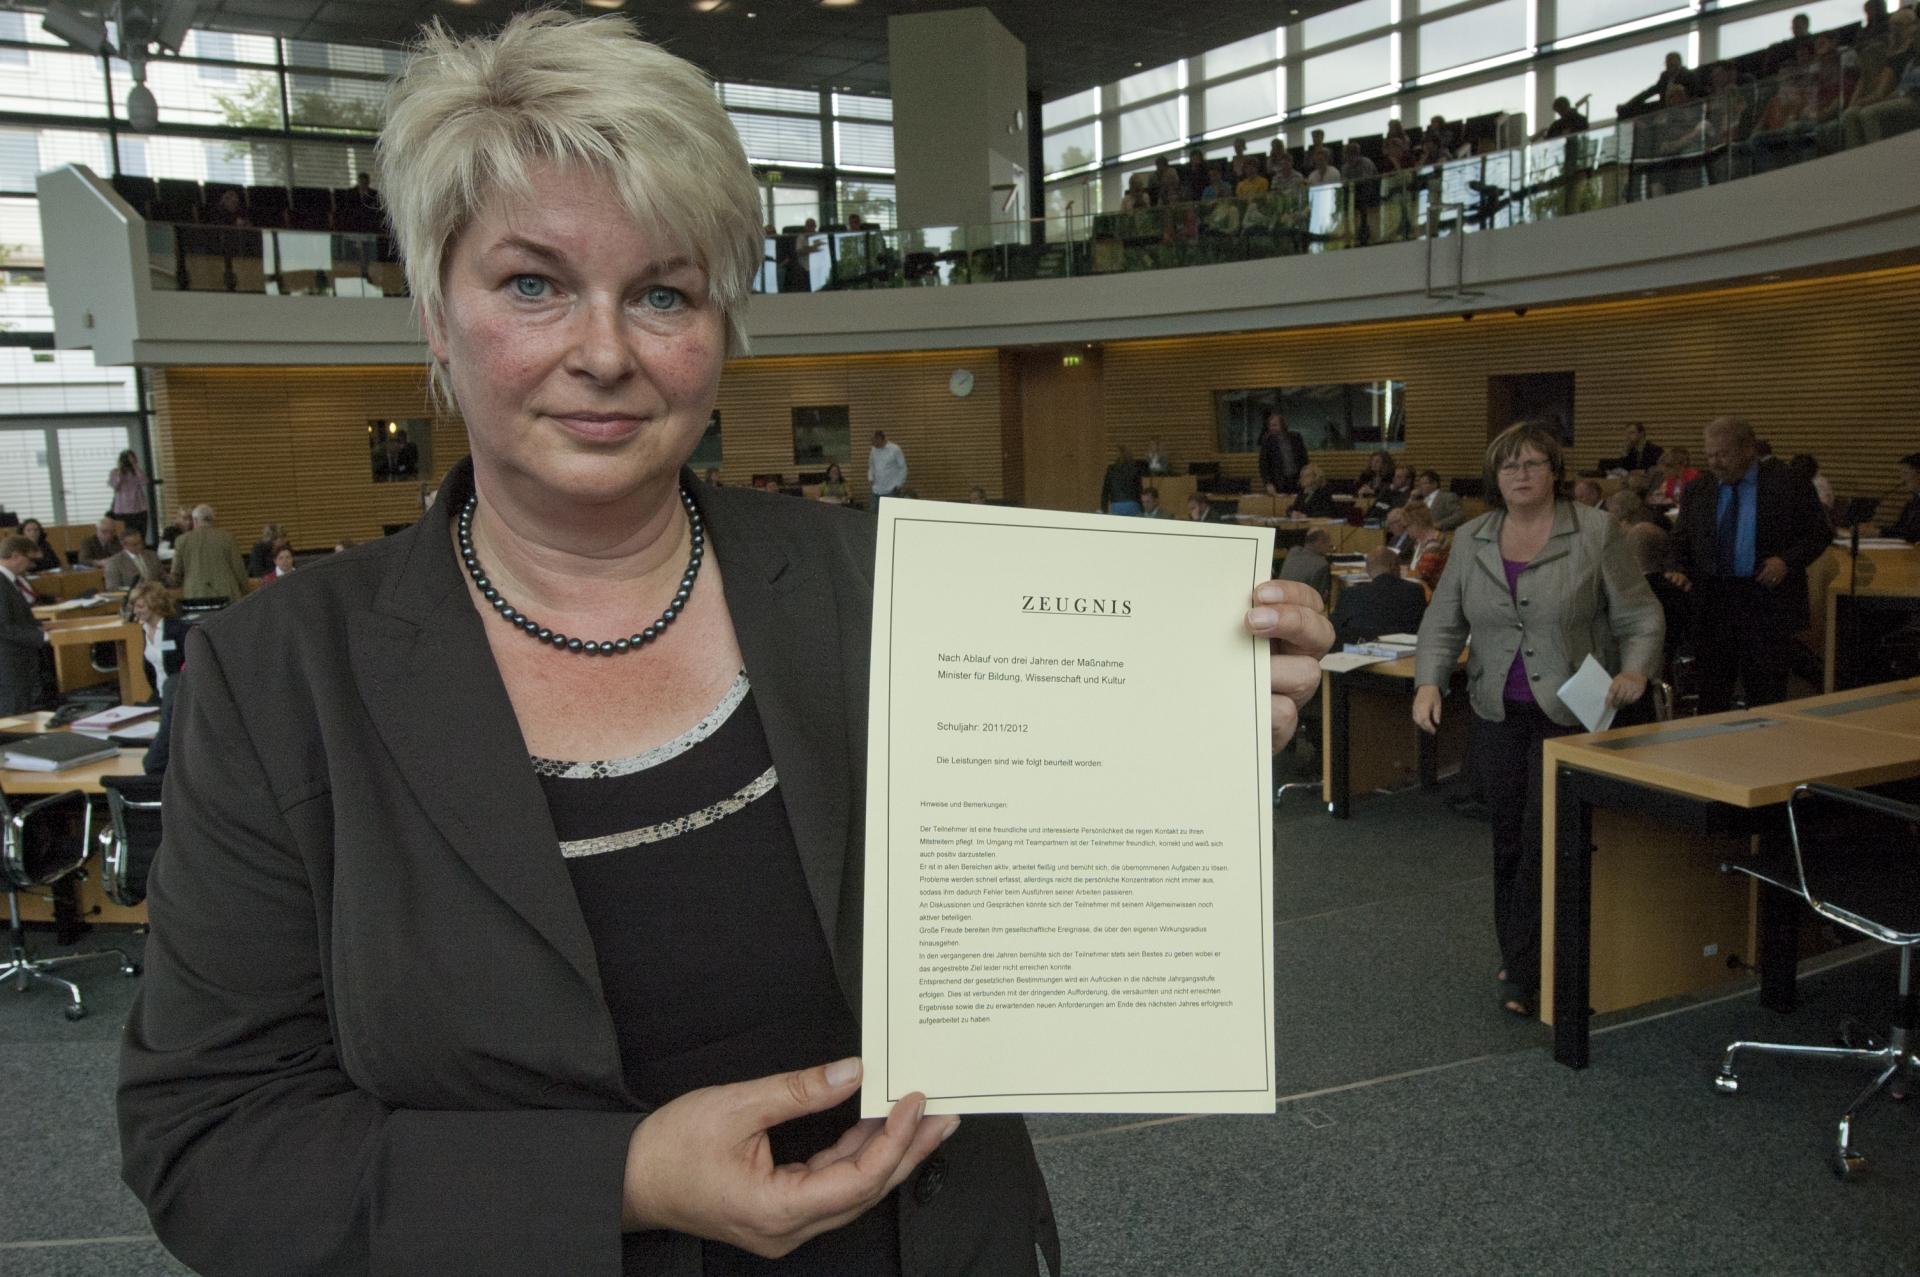 FDP stellt Bildungsminister schlechtes Zeugnis aus